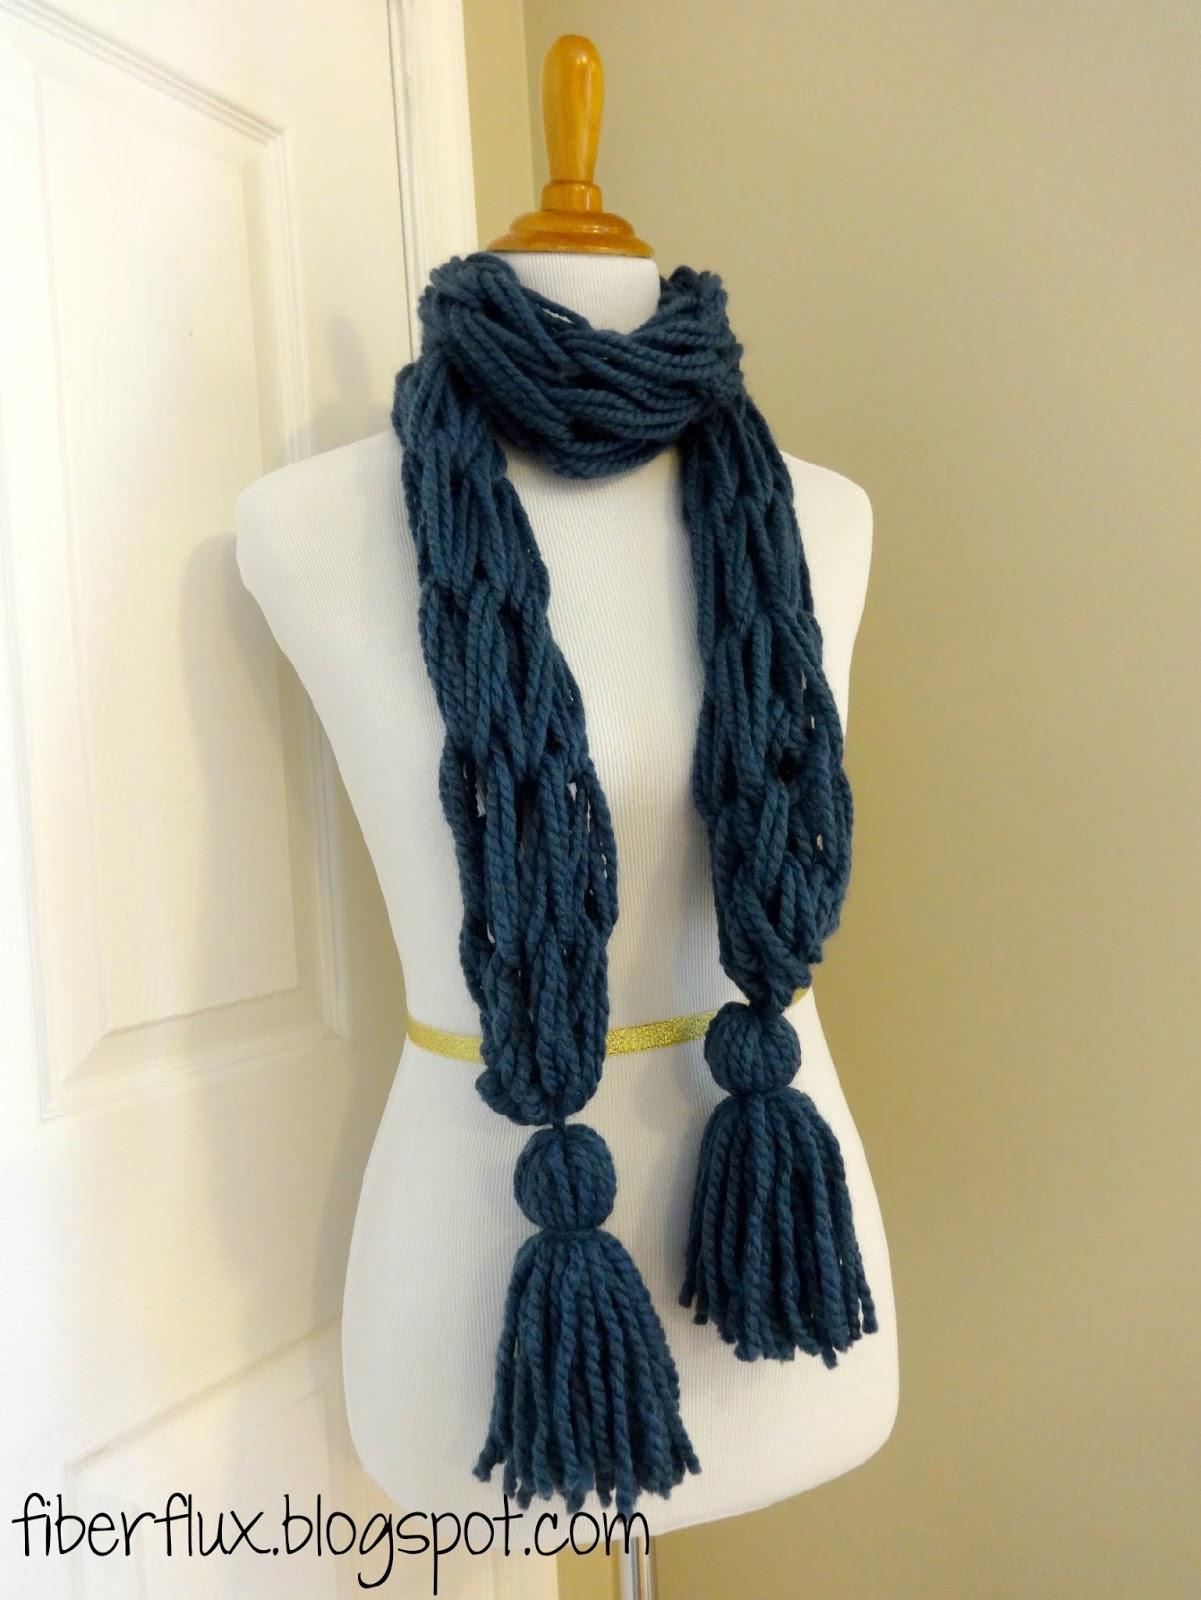 Arm Knitting Scarf Patterns : Fiber Flux: Free Knitting Pattern...Arm Knit Tassel Scarf!